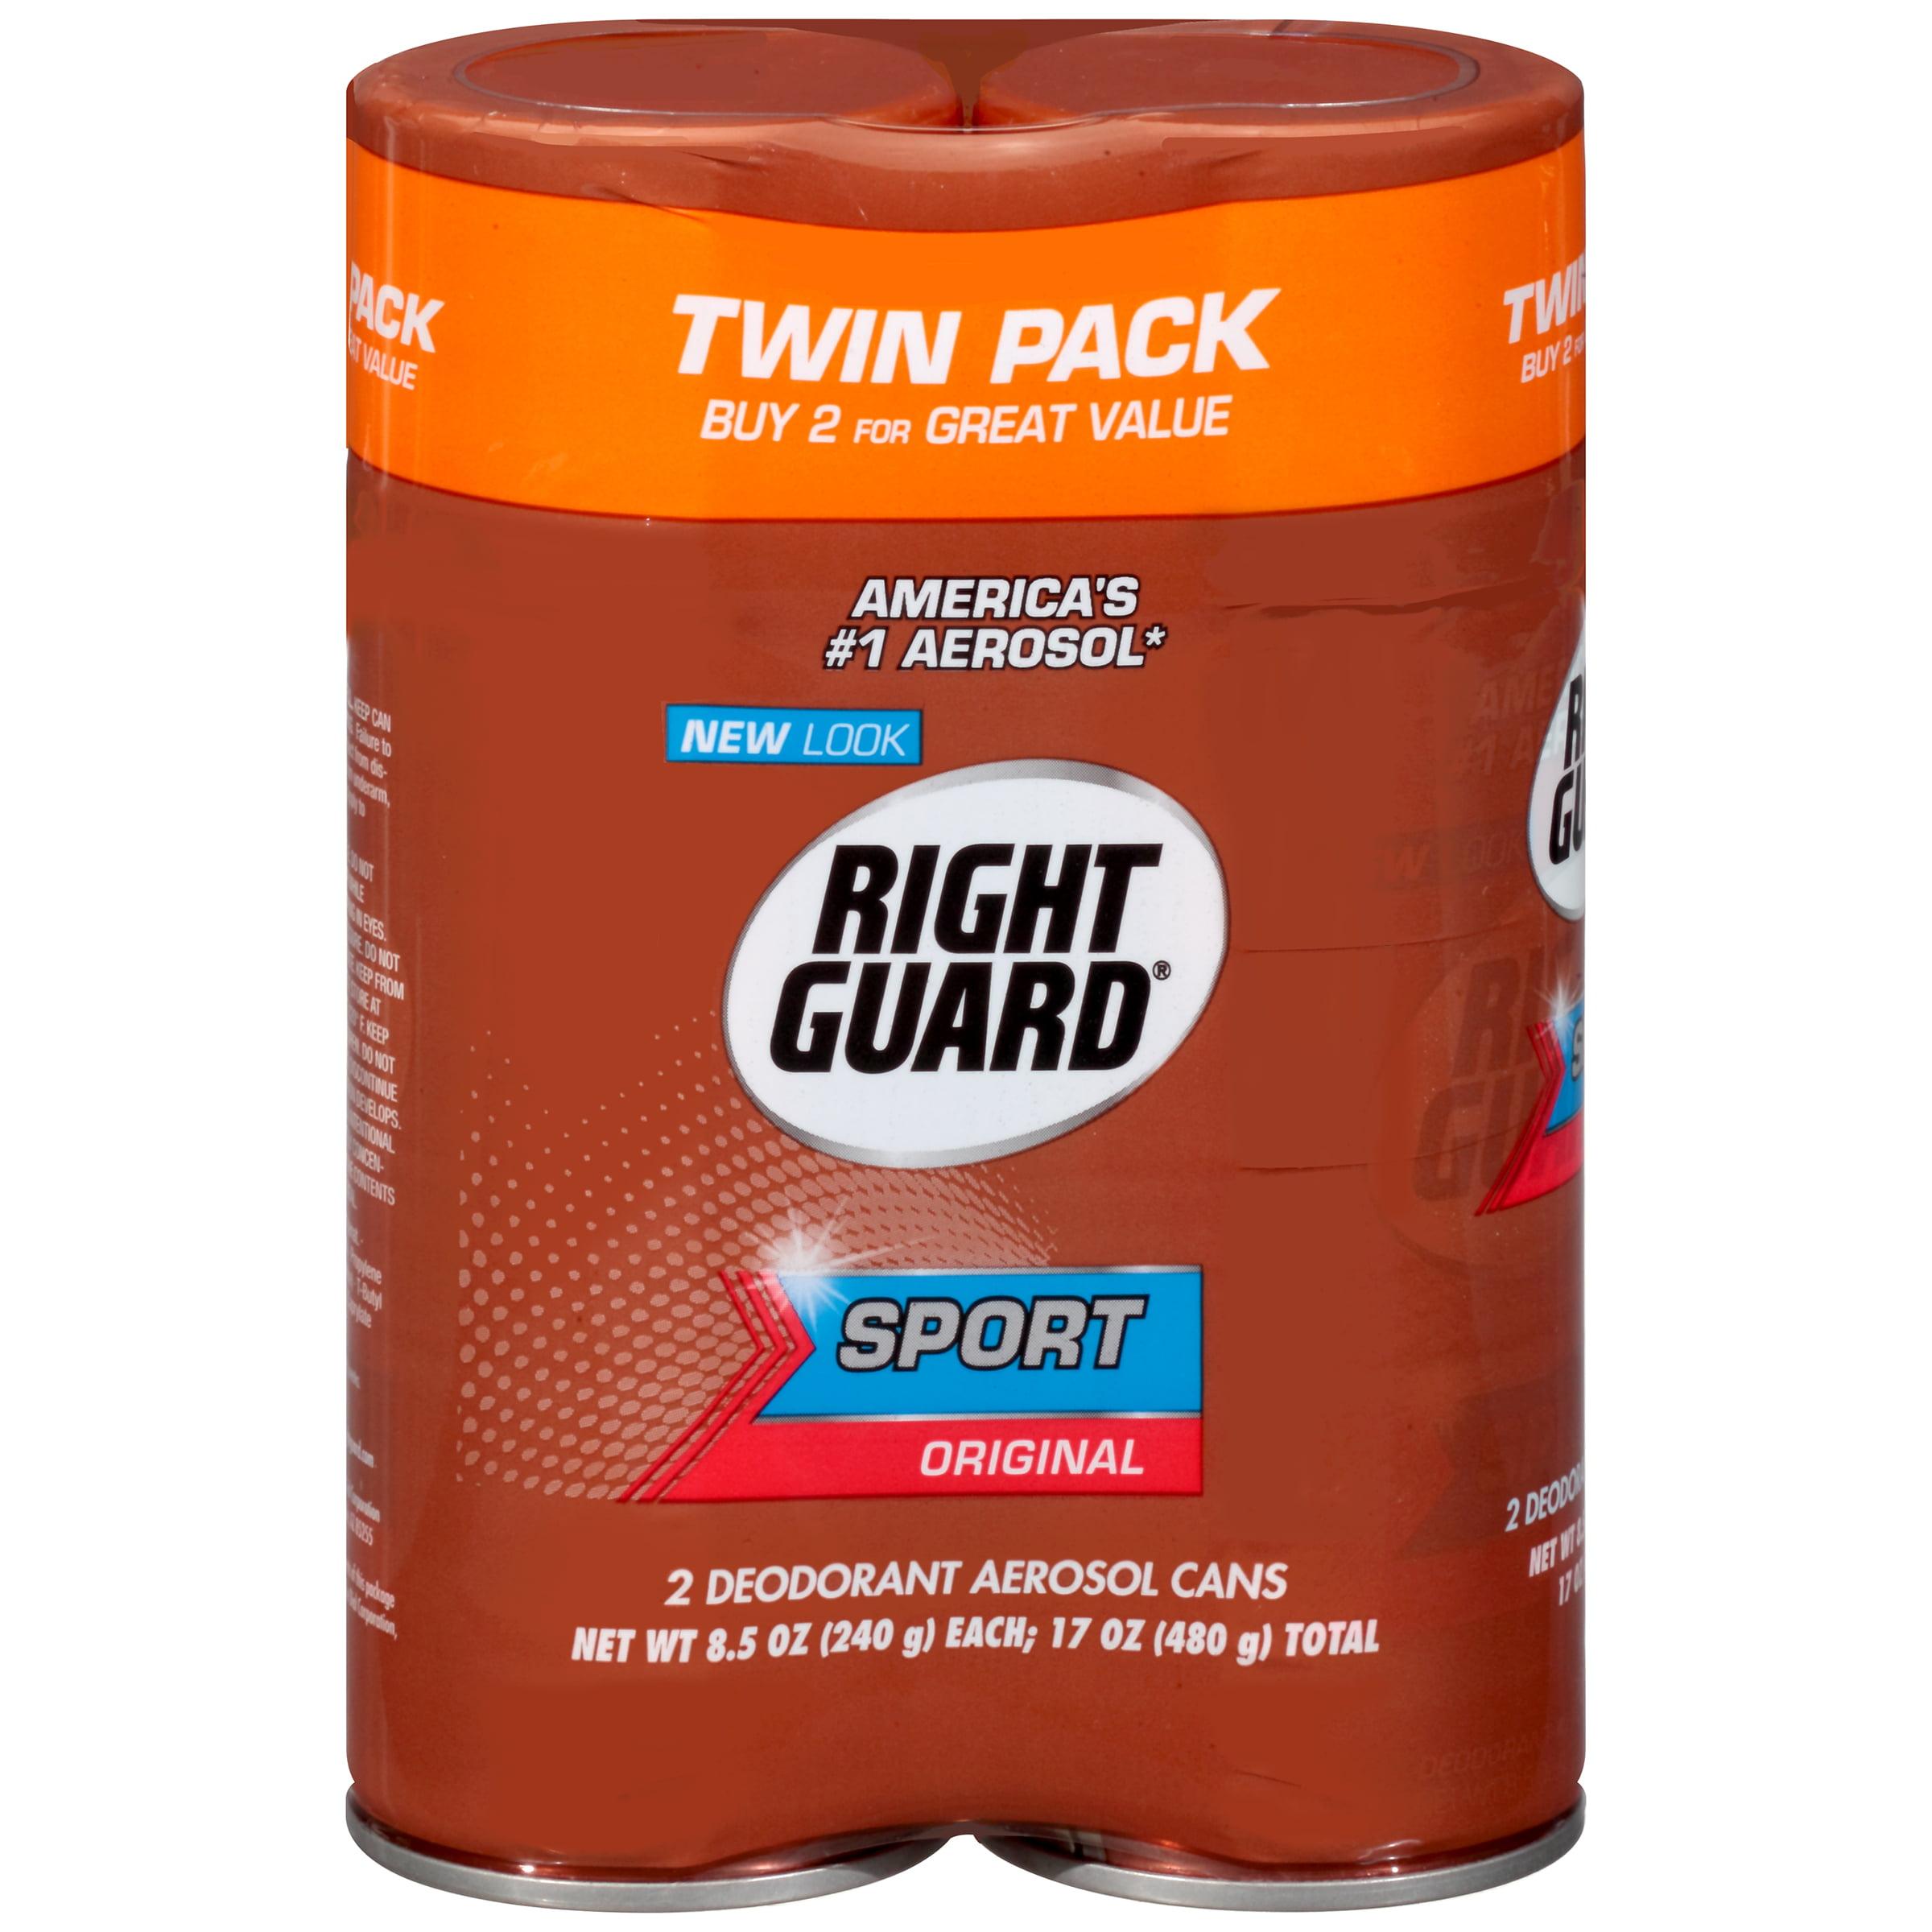 Right Guard Sport Deodorant Aerosol Spray, Original, 8.5 Ounce (Pack of 2)